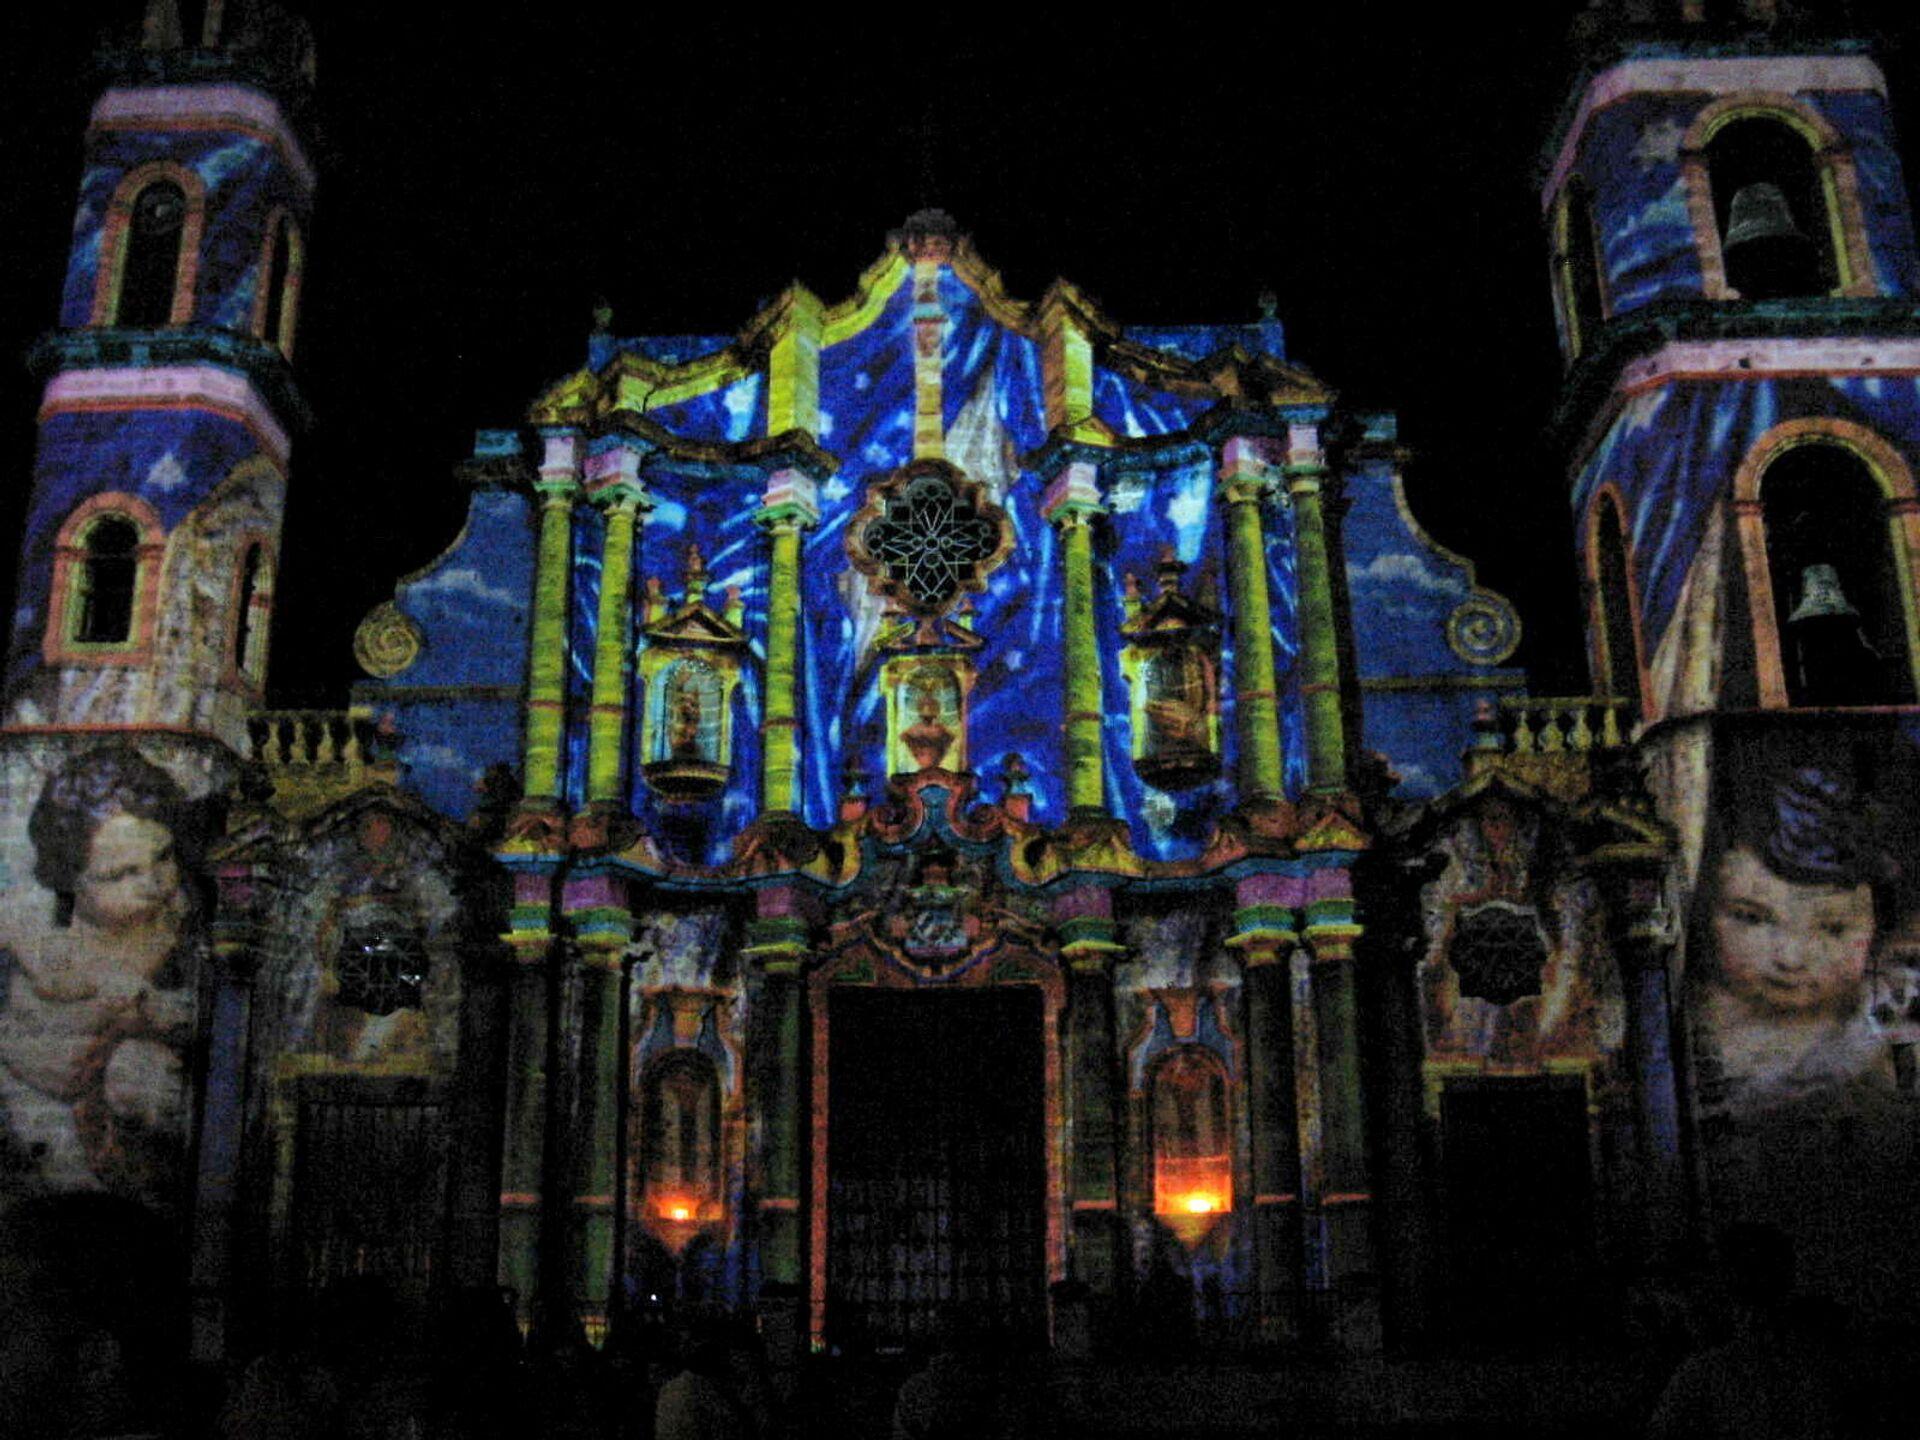 Catedral de La Habana iluminada, marzo de 2012, obra del artista italo-francés Gaspare Di Caro - Sputnik Mundo, 1920, 22.02.2021